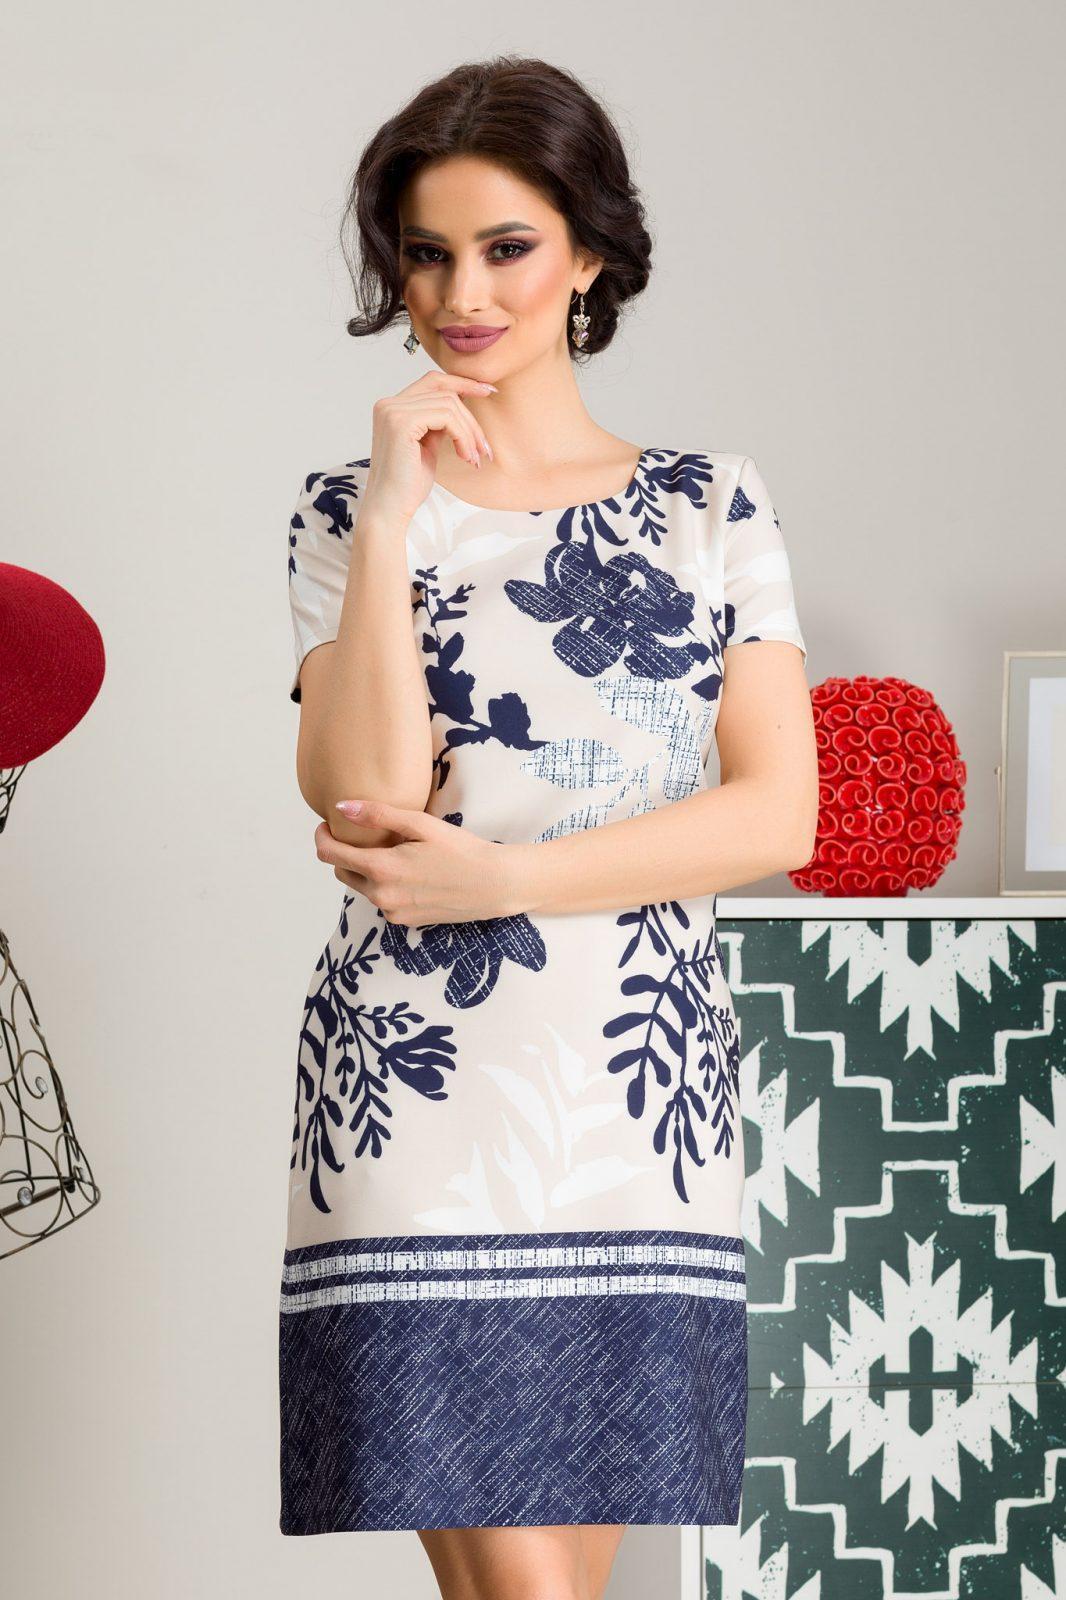 Naylin Μπλε Φόρεμα 7297